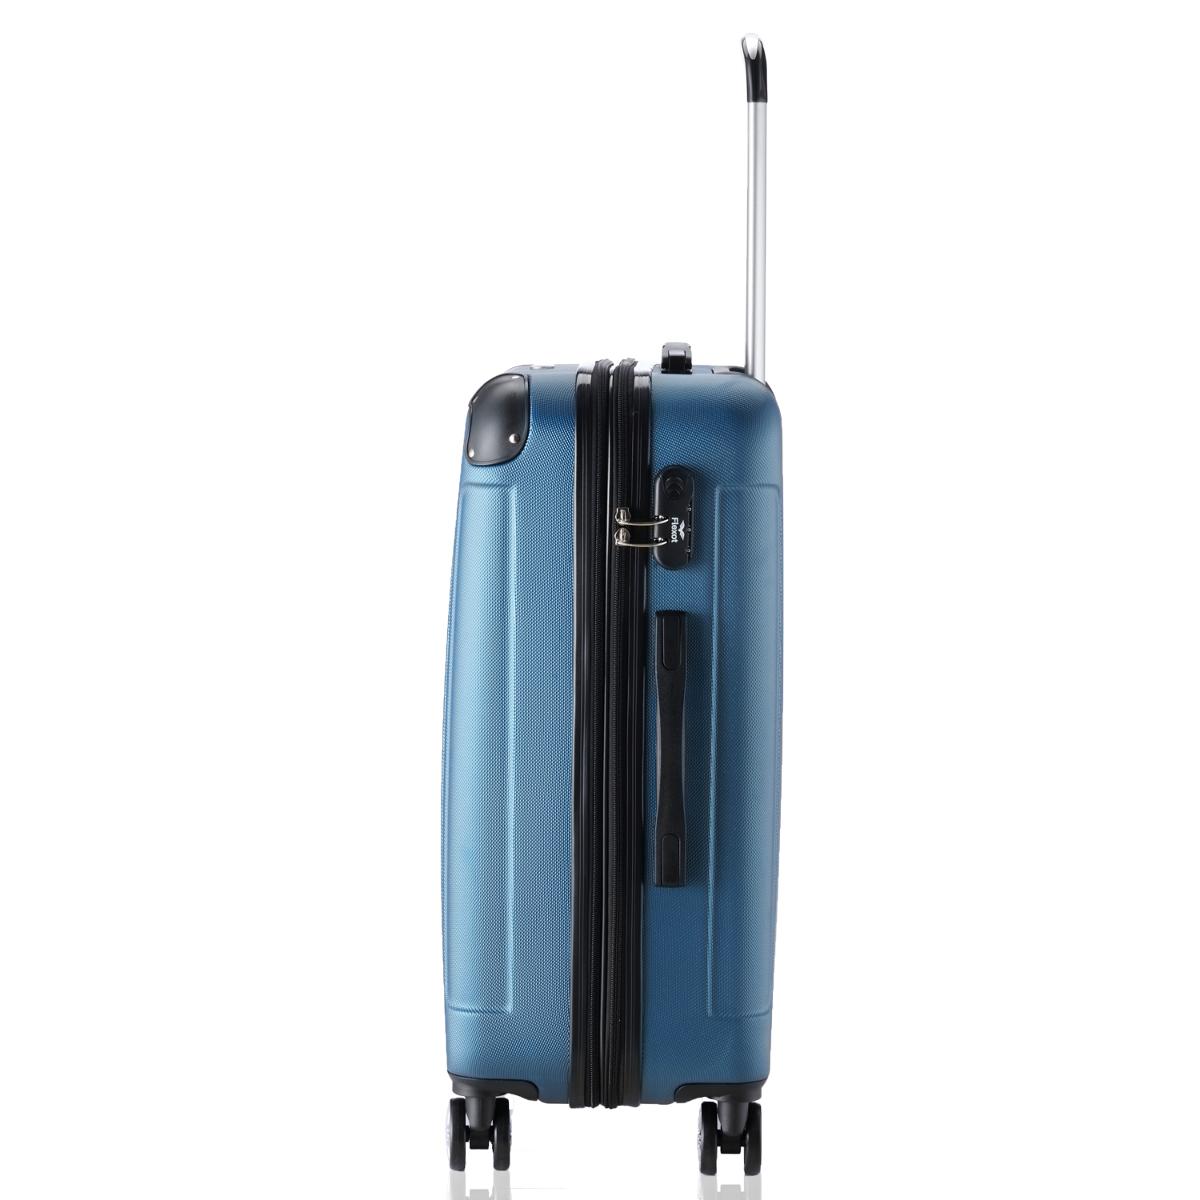 Koffer-Flexot-2045-Hartschalenkoffer-Trolley-Kofferset-Reisekoffer-M-L-XL-Set Indexbild 14